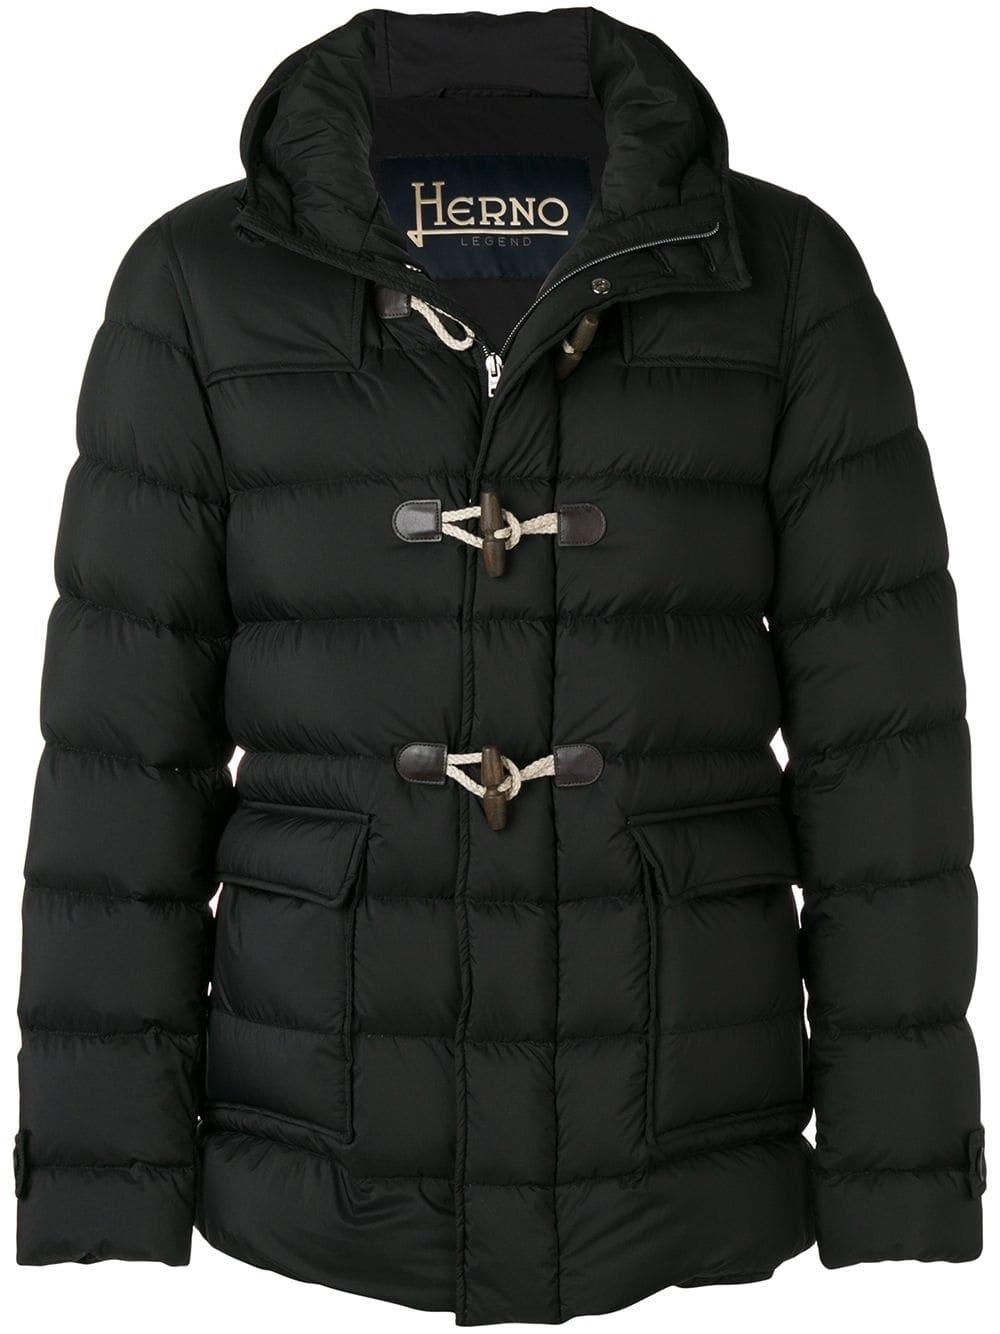 HERNO(ヘルノ) メンズダウンジャケット